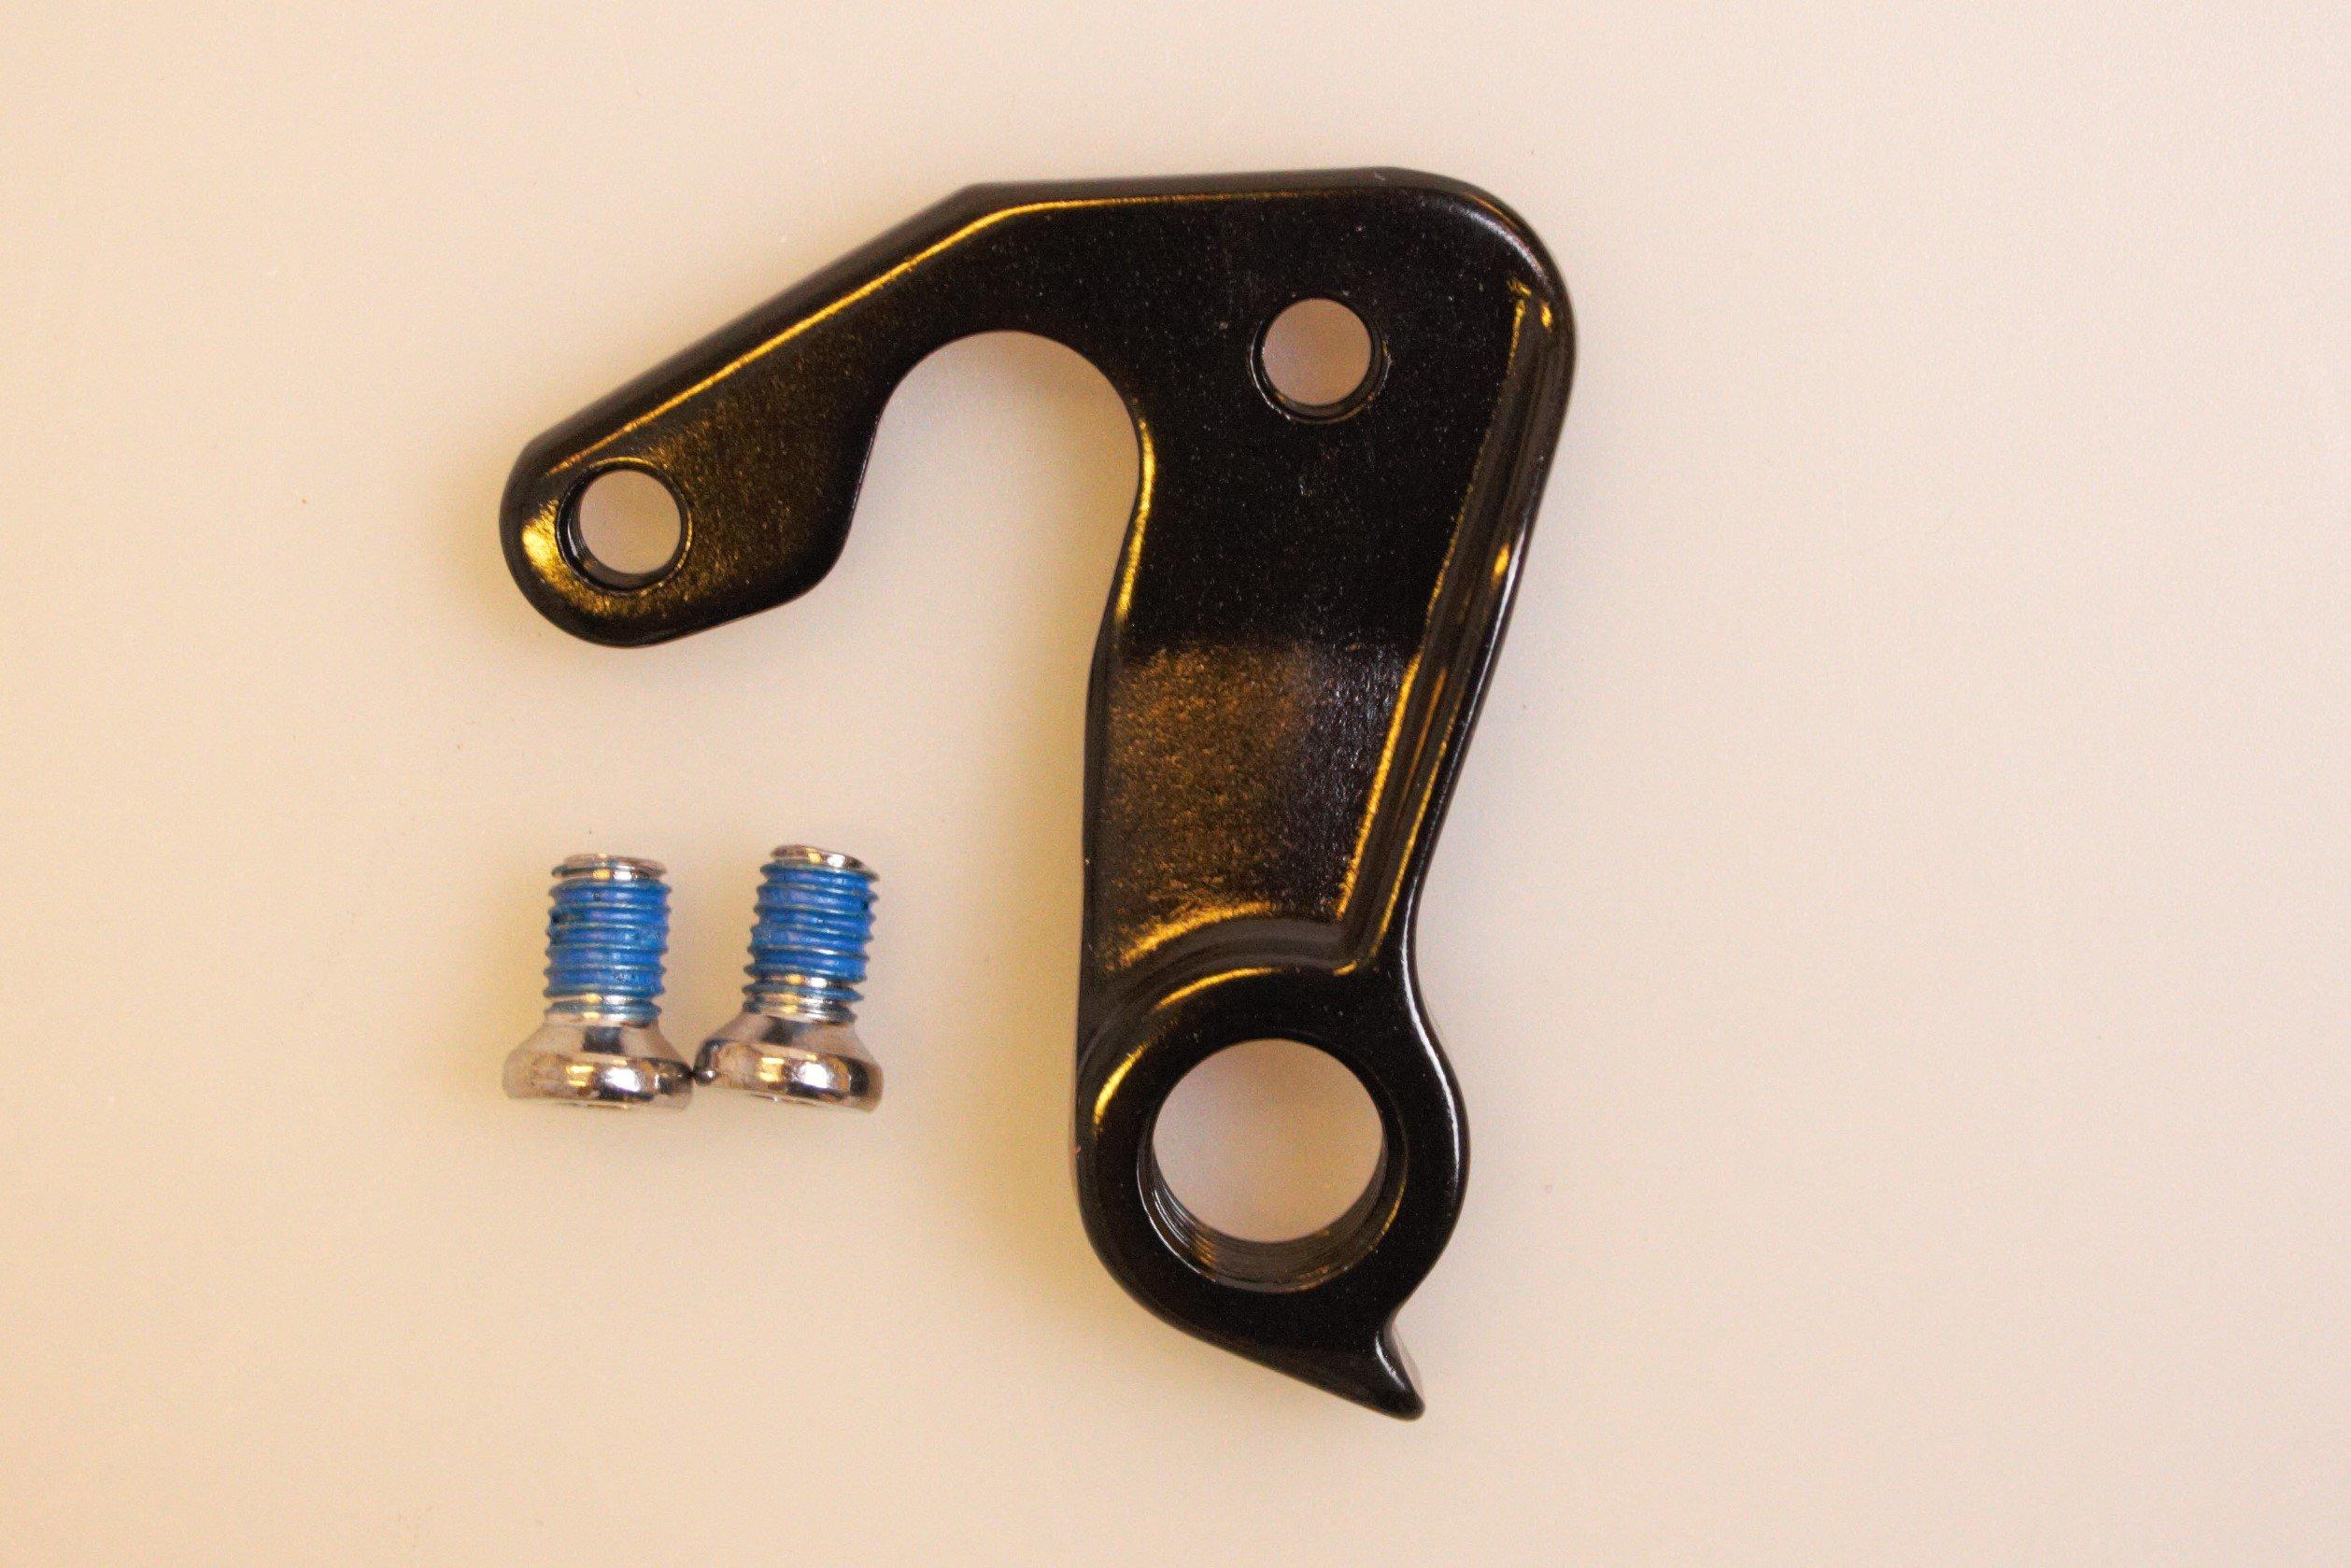 Geardrop Type A | Derailleur hanger